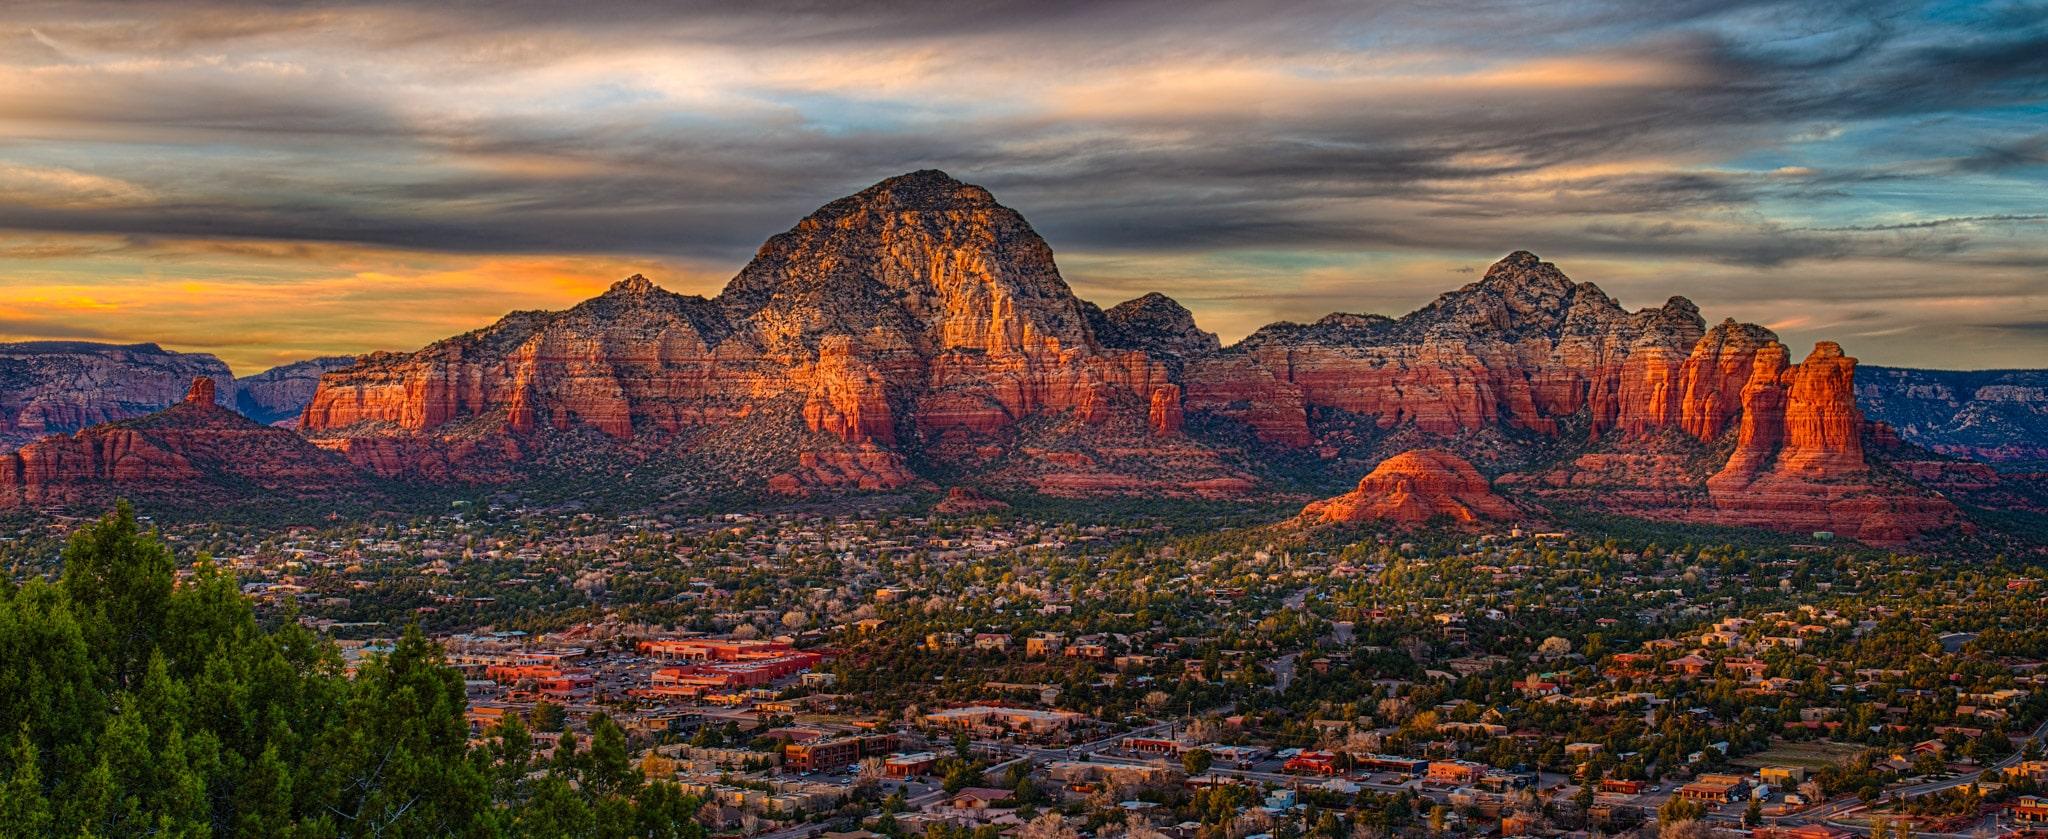 The last light of day illuminates the iconic rock formations that provide a backdrop to Sedona, Arizona.